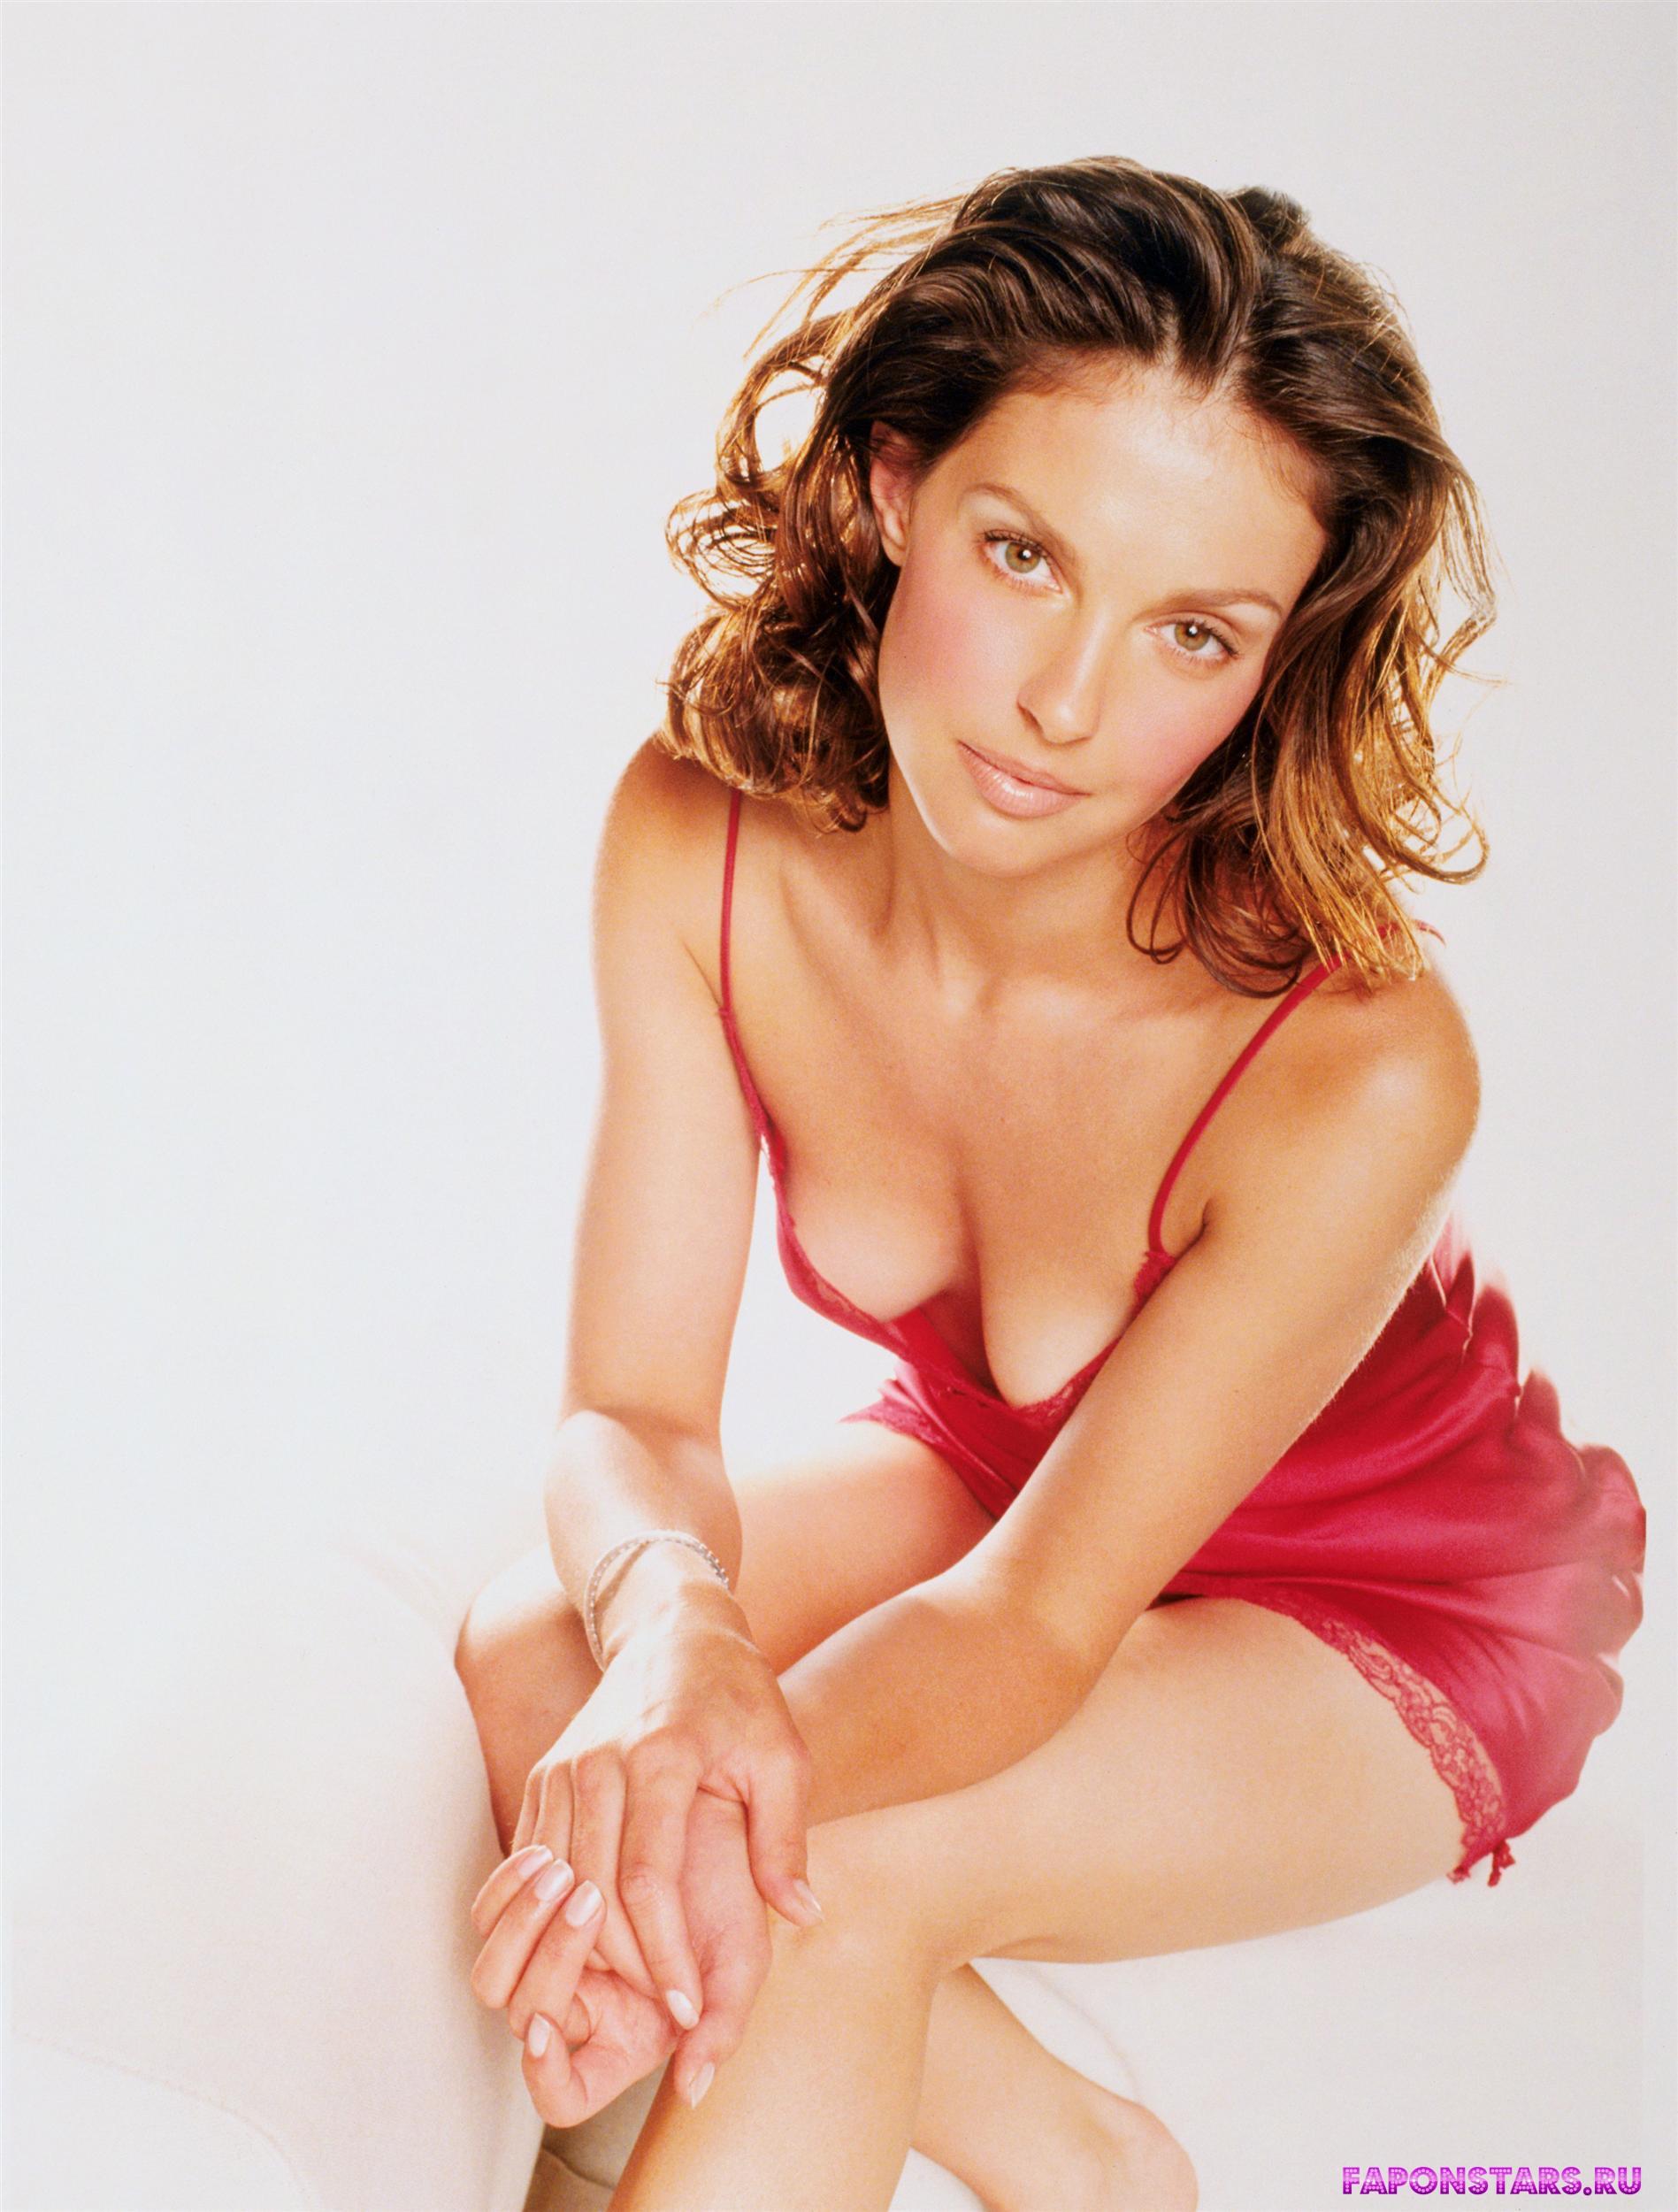 Ashley Judd / Эшли Джадд интимное фото